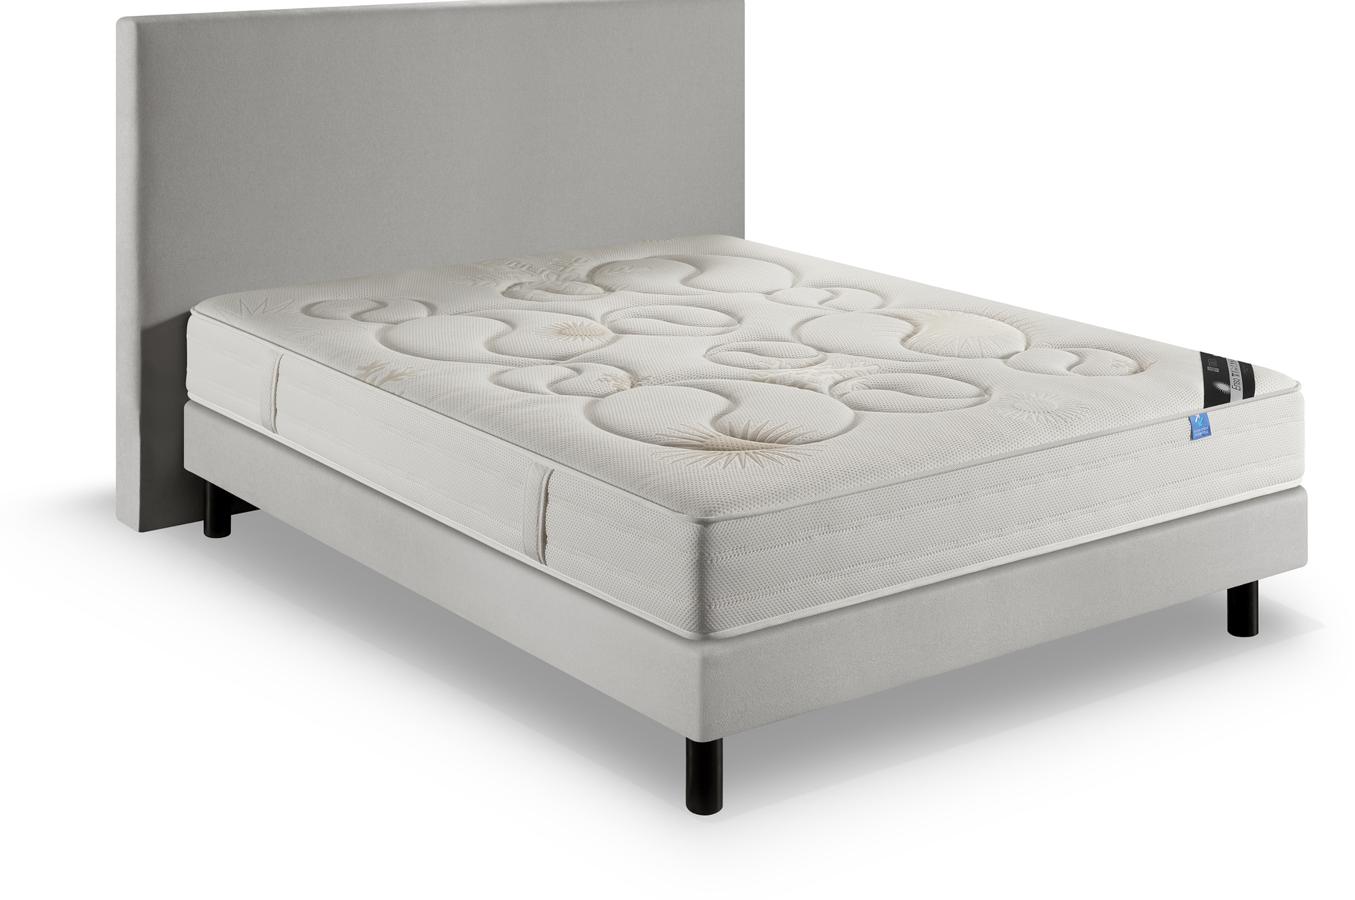 pack ensemble matelas et sommier treca enso 160x200 d24. Black Bedroom Furniture Sets. Home Design Ideas